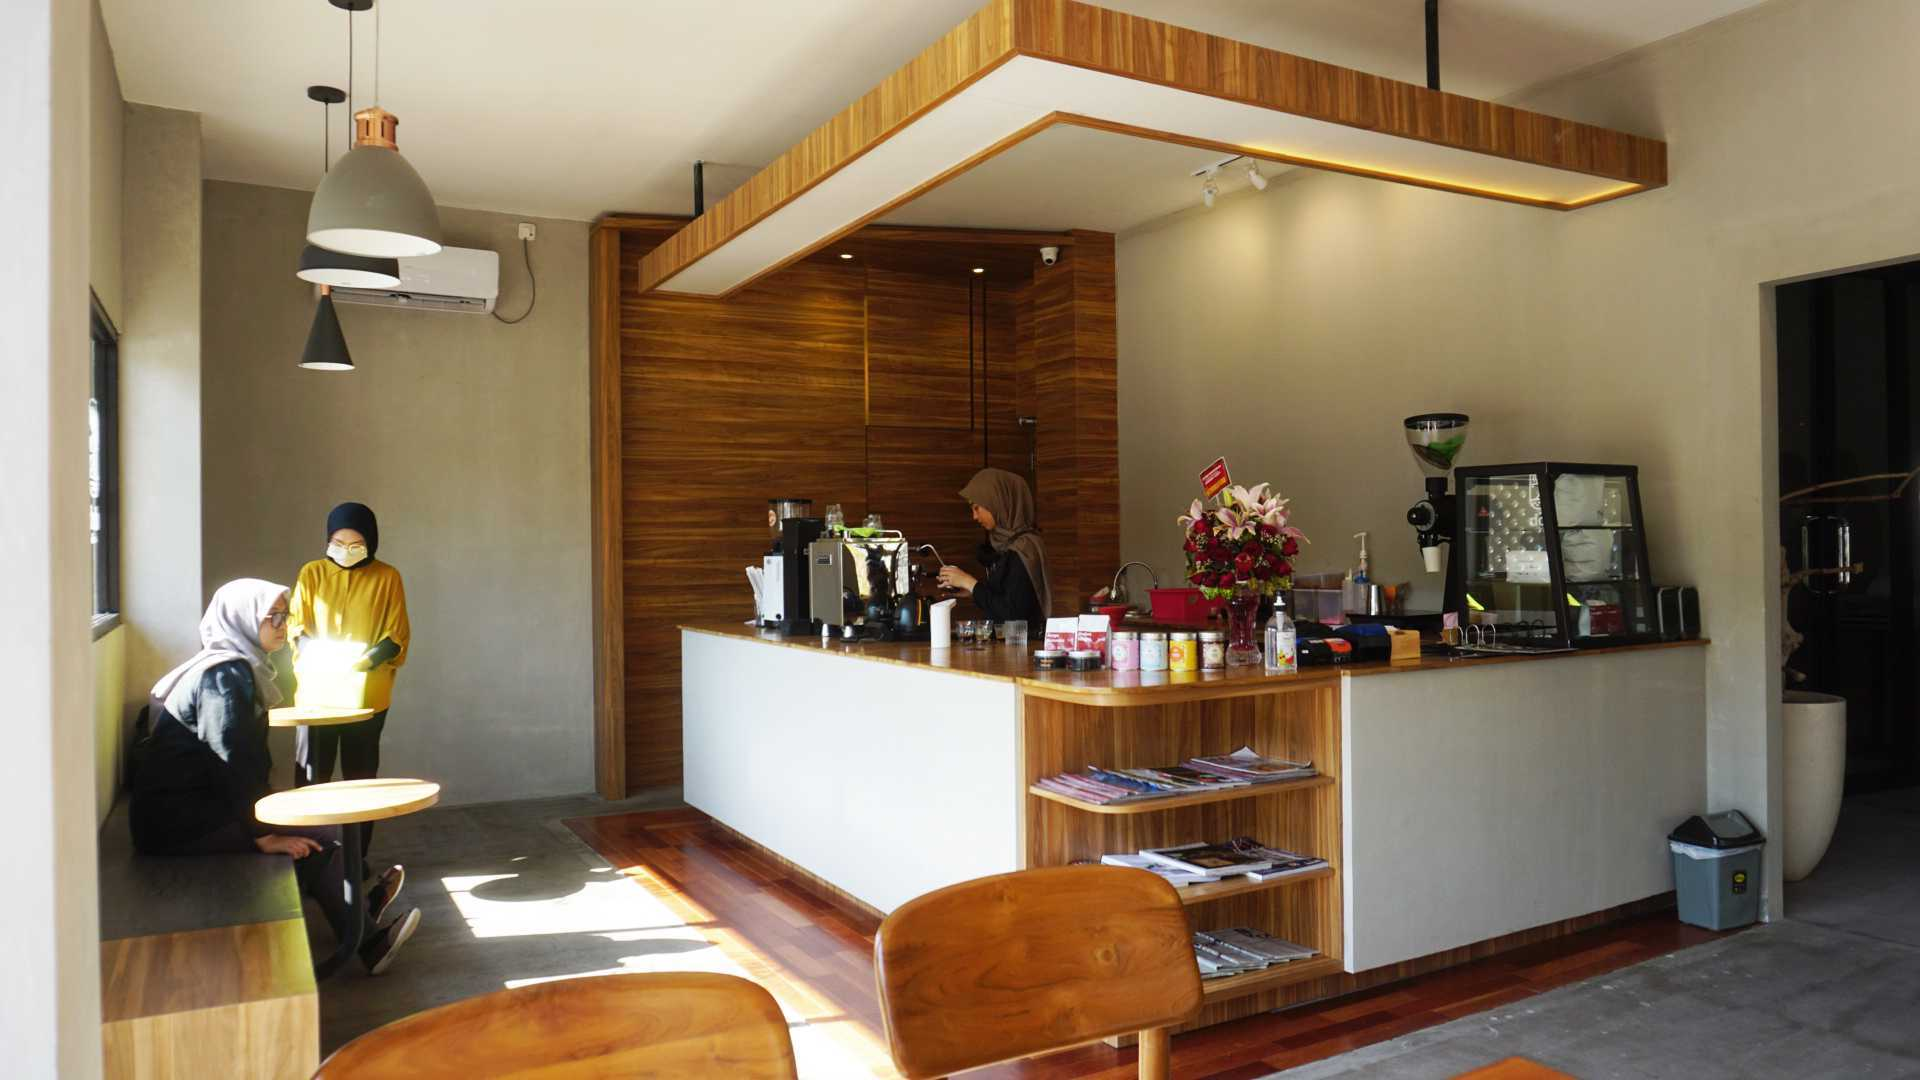 Sekala Darbe Cafe & Office, Surabaya Surabaya, Kota Sby, Jawa Timur, Indonesia Surabaya, Kota Sby, Jawa Timur, Indonesia Sekala-Drabe-Cafe-Office  97789